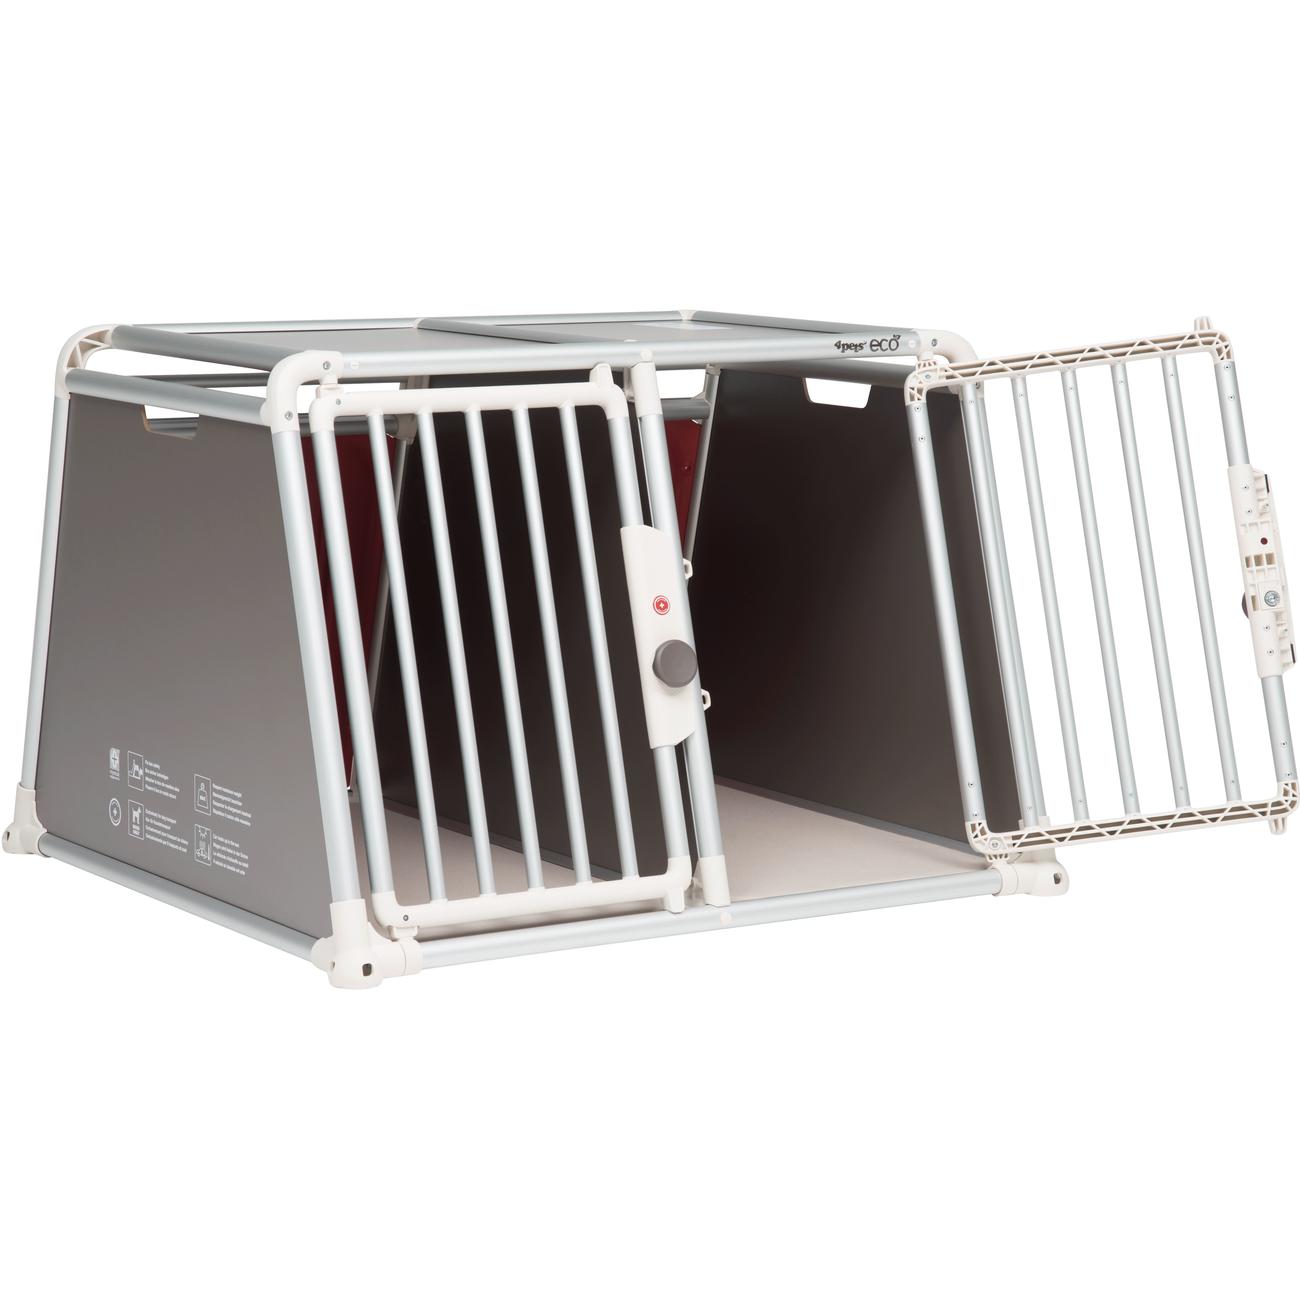 4pets Alu Autobox für 2 Hunde ECO 22, Bild 4